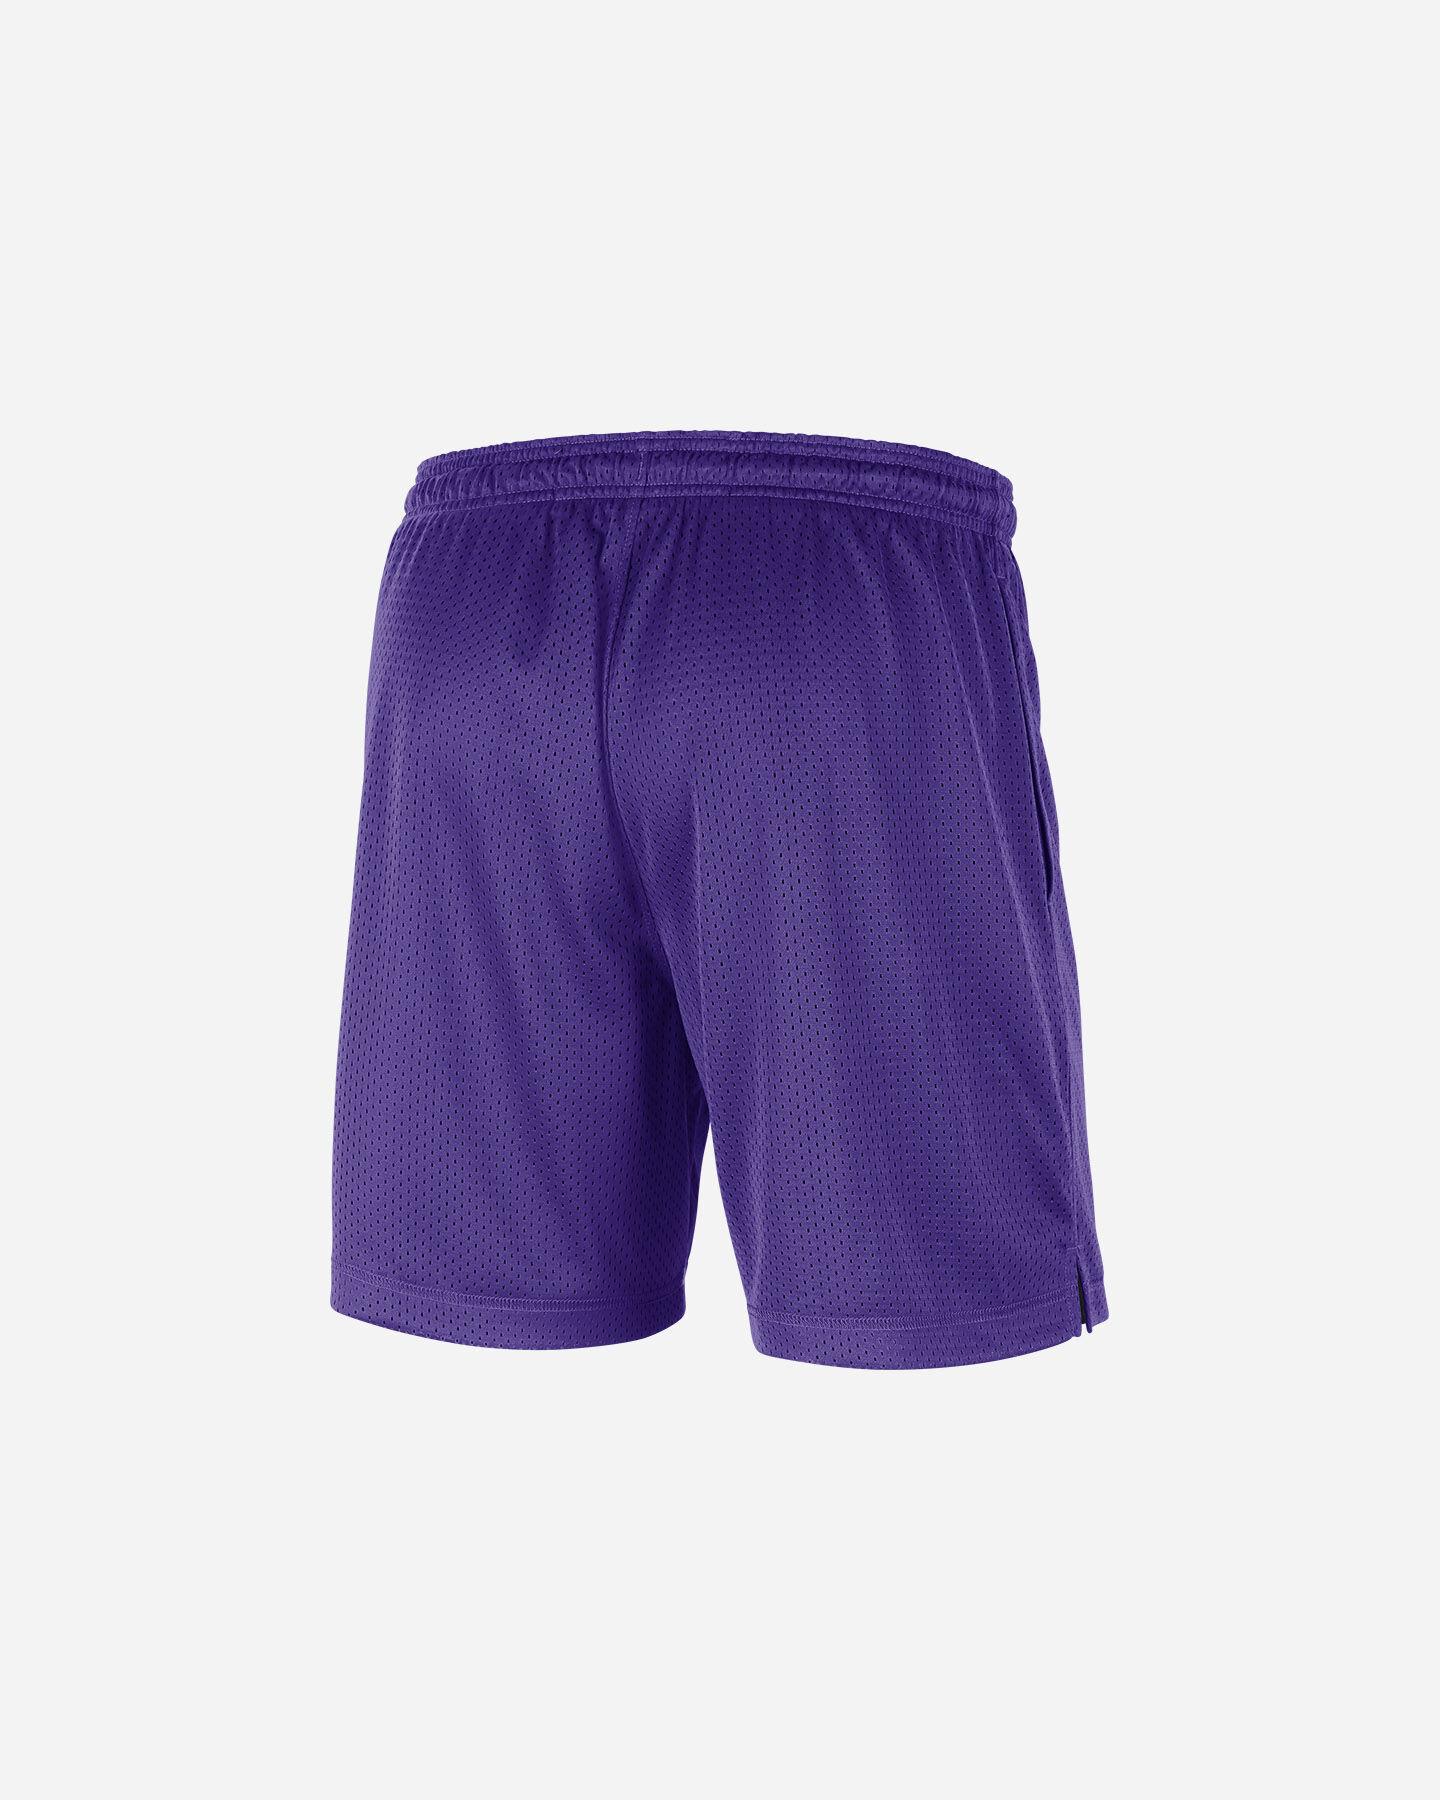 Pantaloncini basket NIKE LA LAKERS STD ISSUES M S5248861 scatto 4